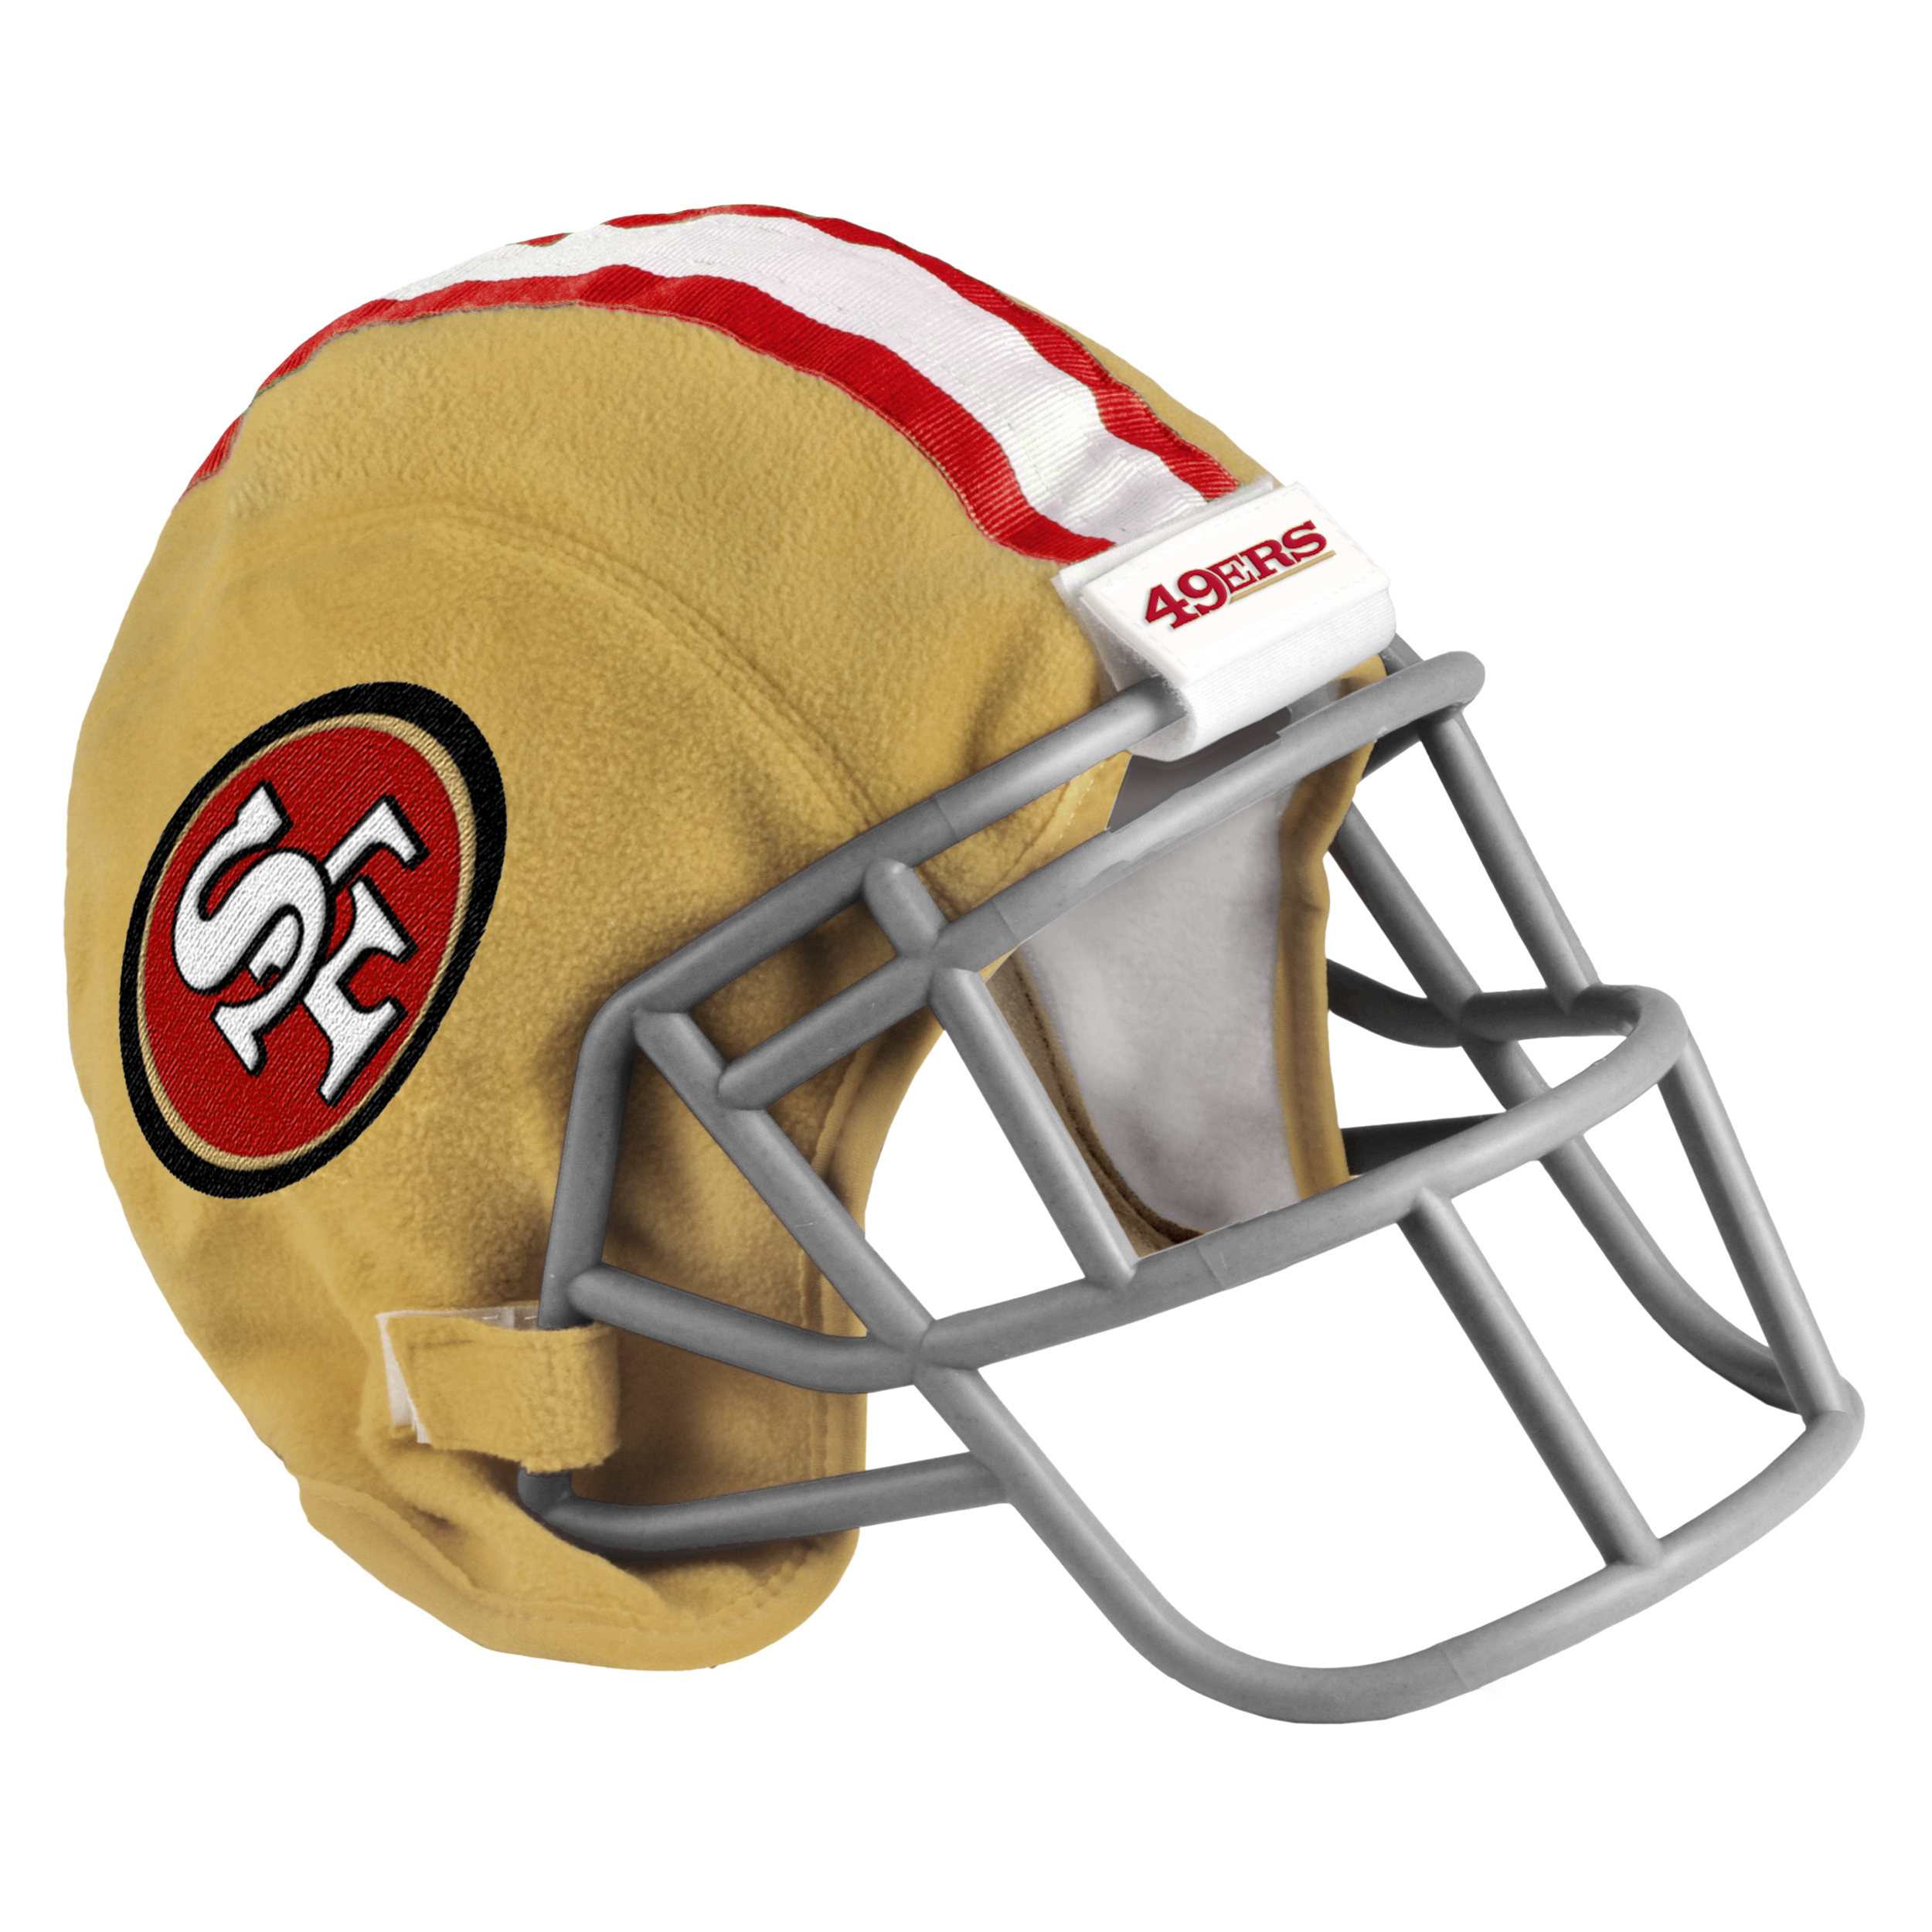 cd4d240d3 NFL San Francisco 49ers Helmet Hat Fitness   Sports Fan Shop NFL on ...